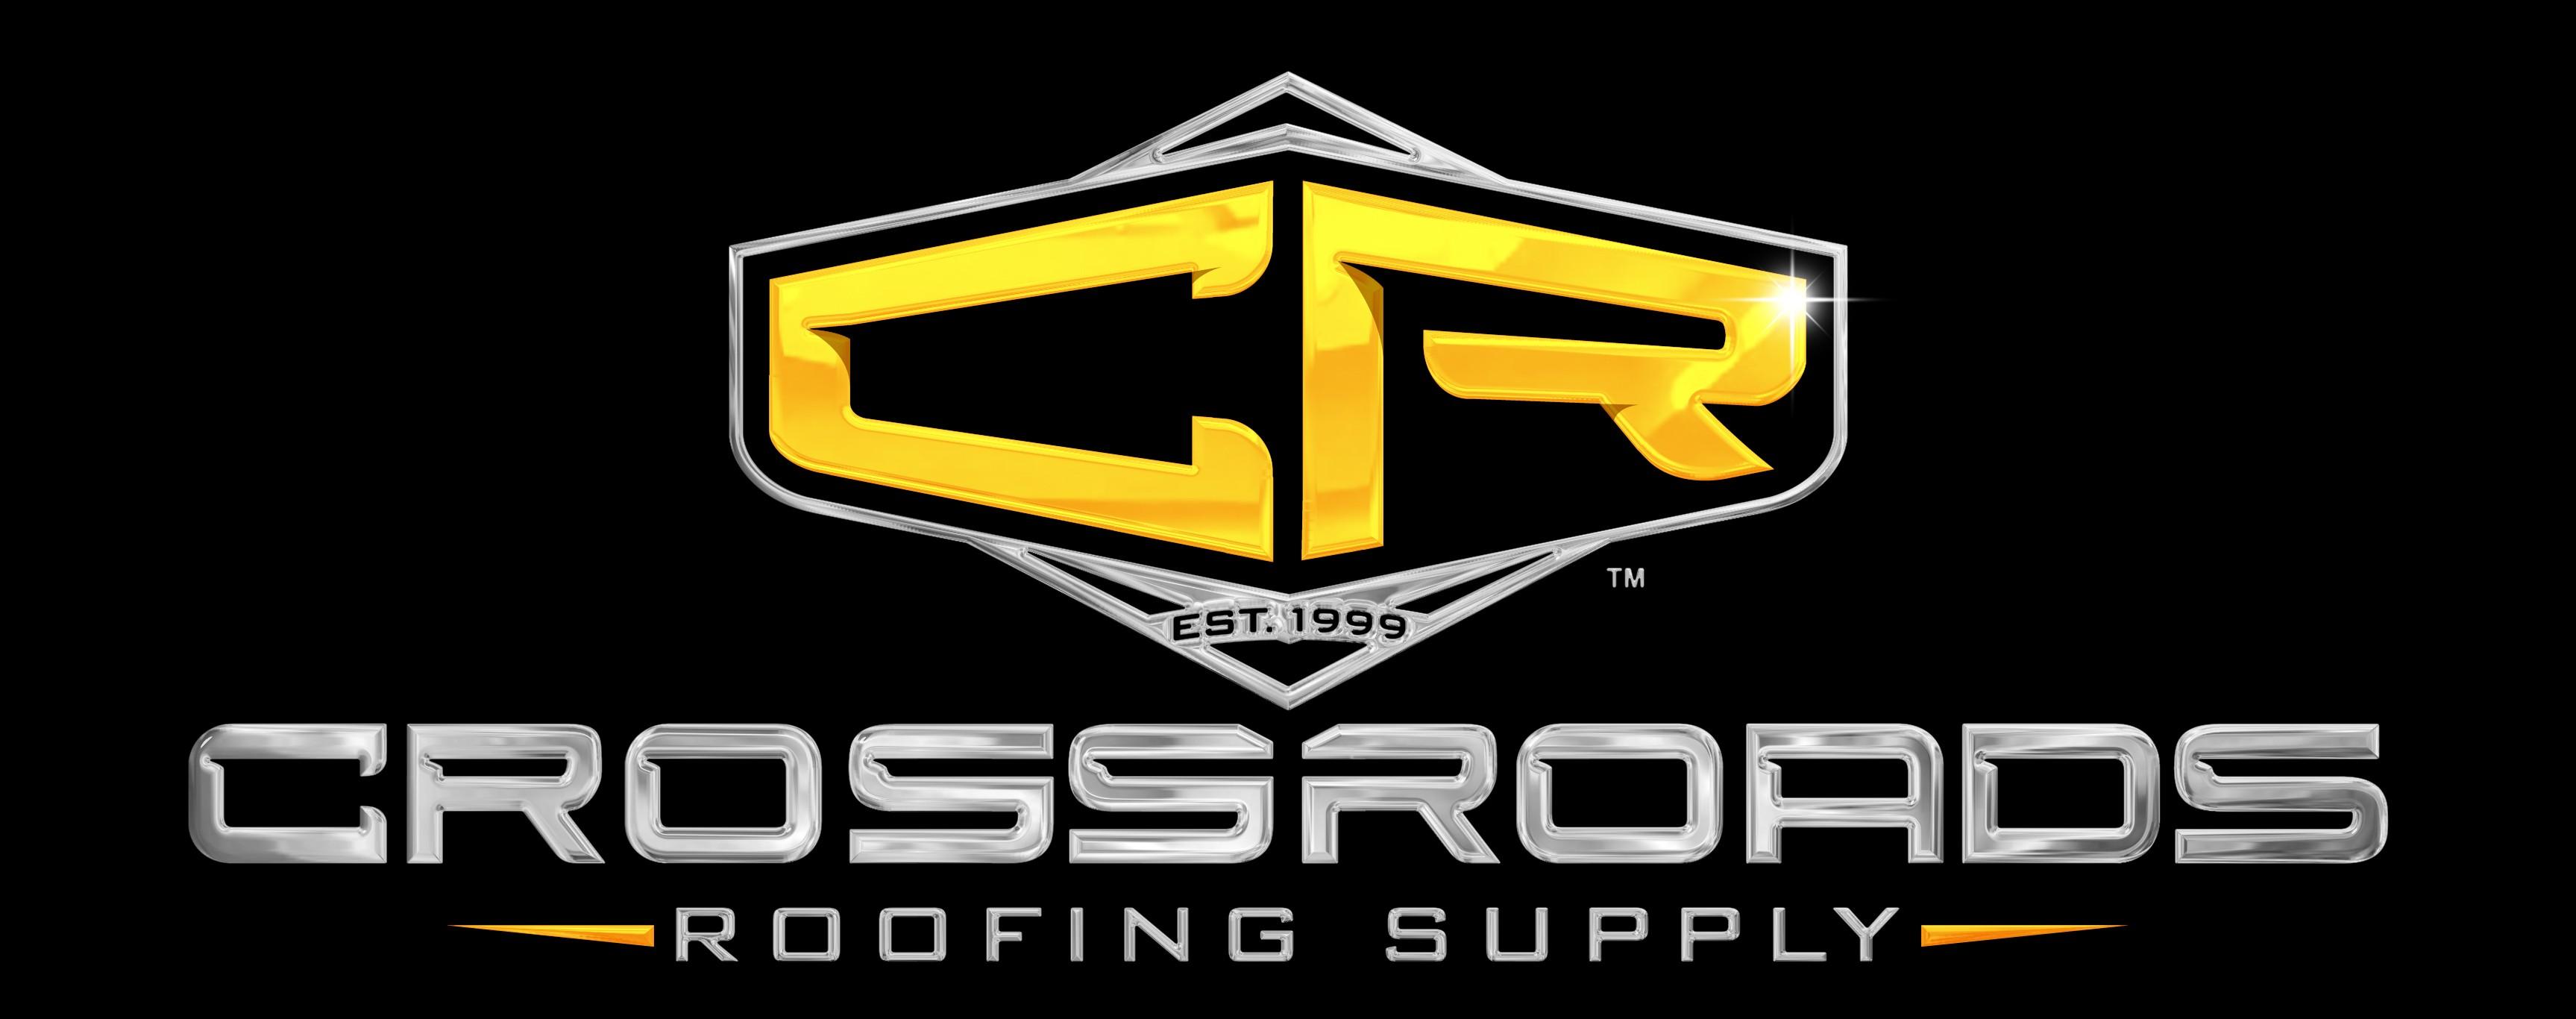 Crossroads Roofing Supply Linkedin